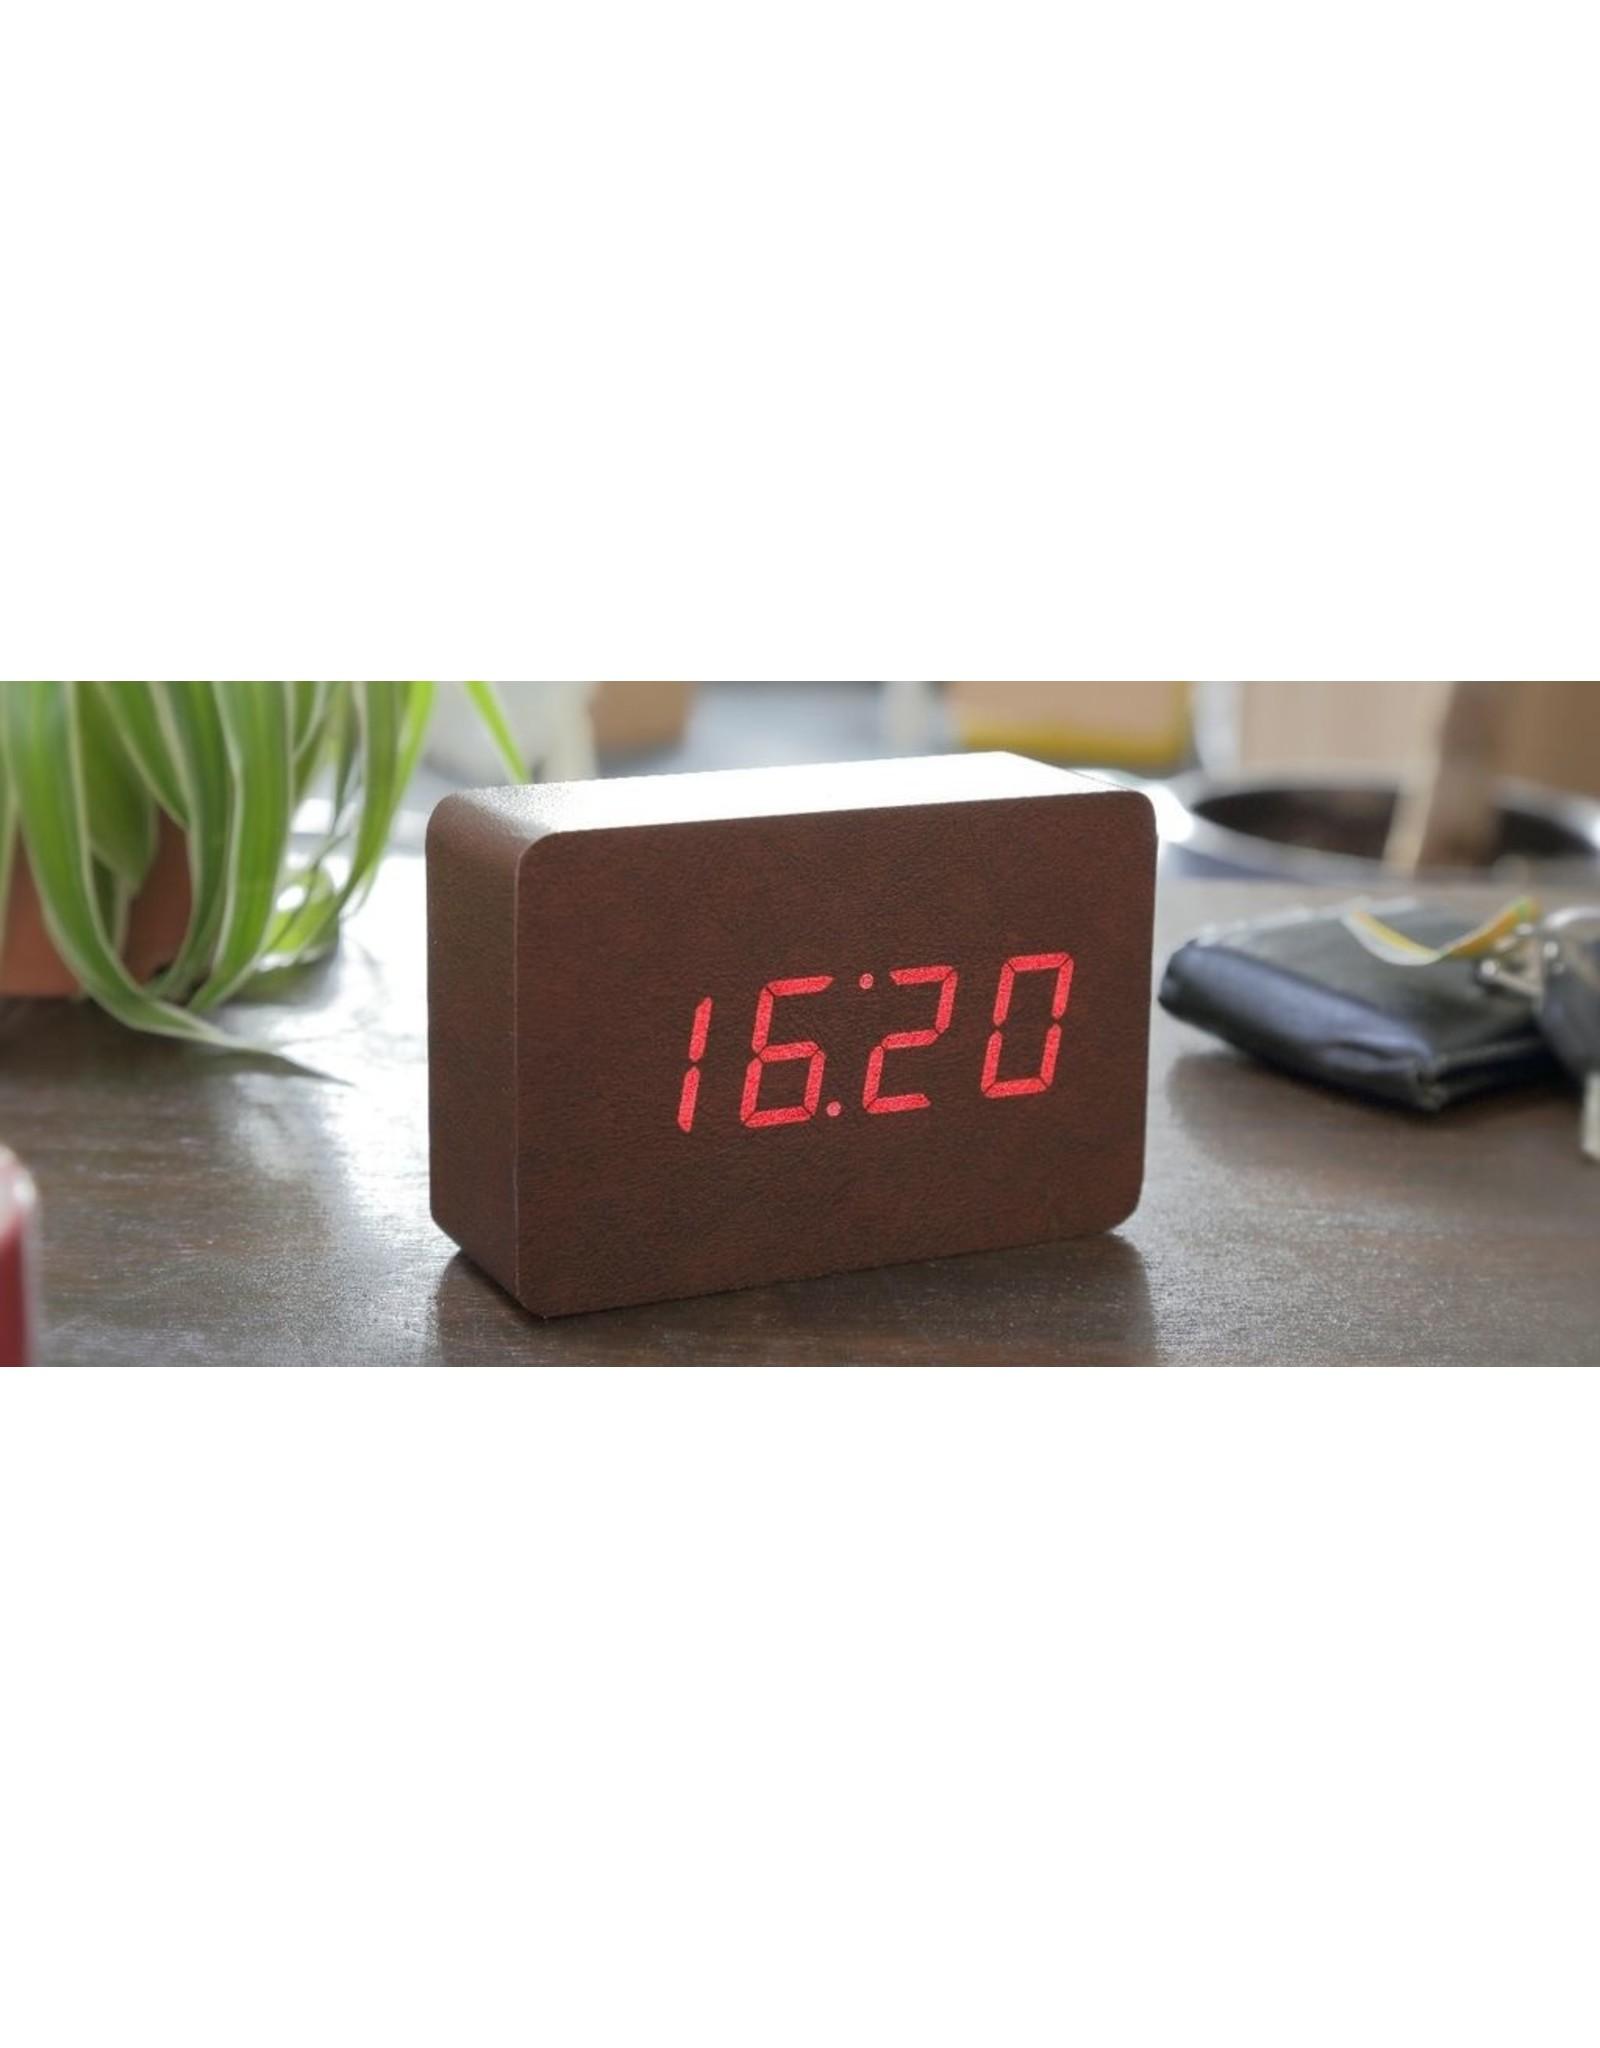 Gingko electronics LTD BRICK CLOCK CLOCK COPPER-LEATHER